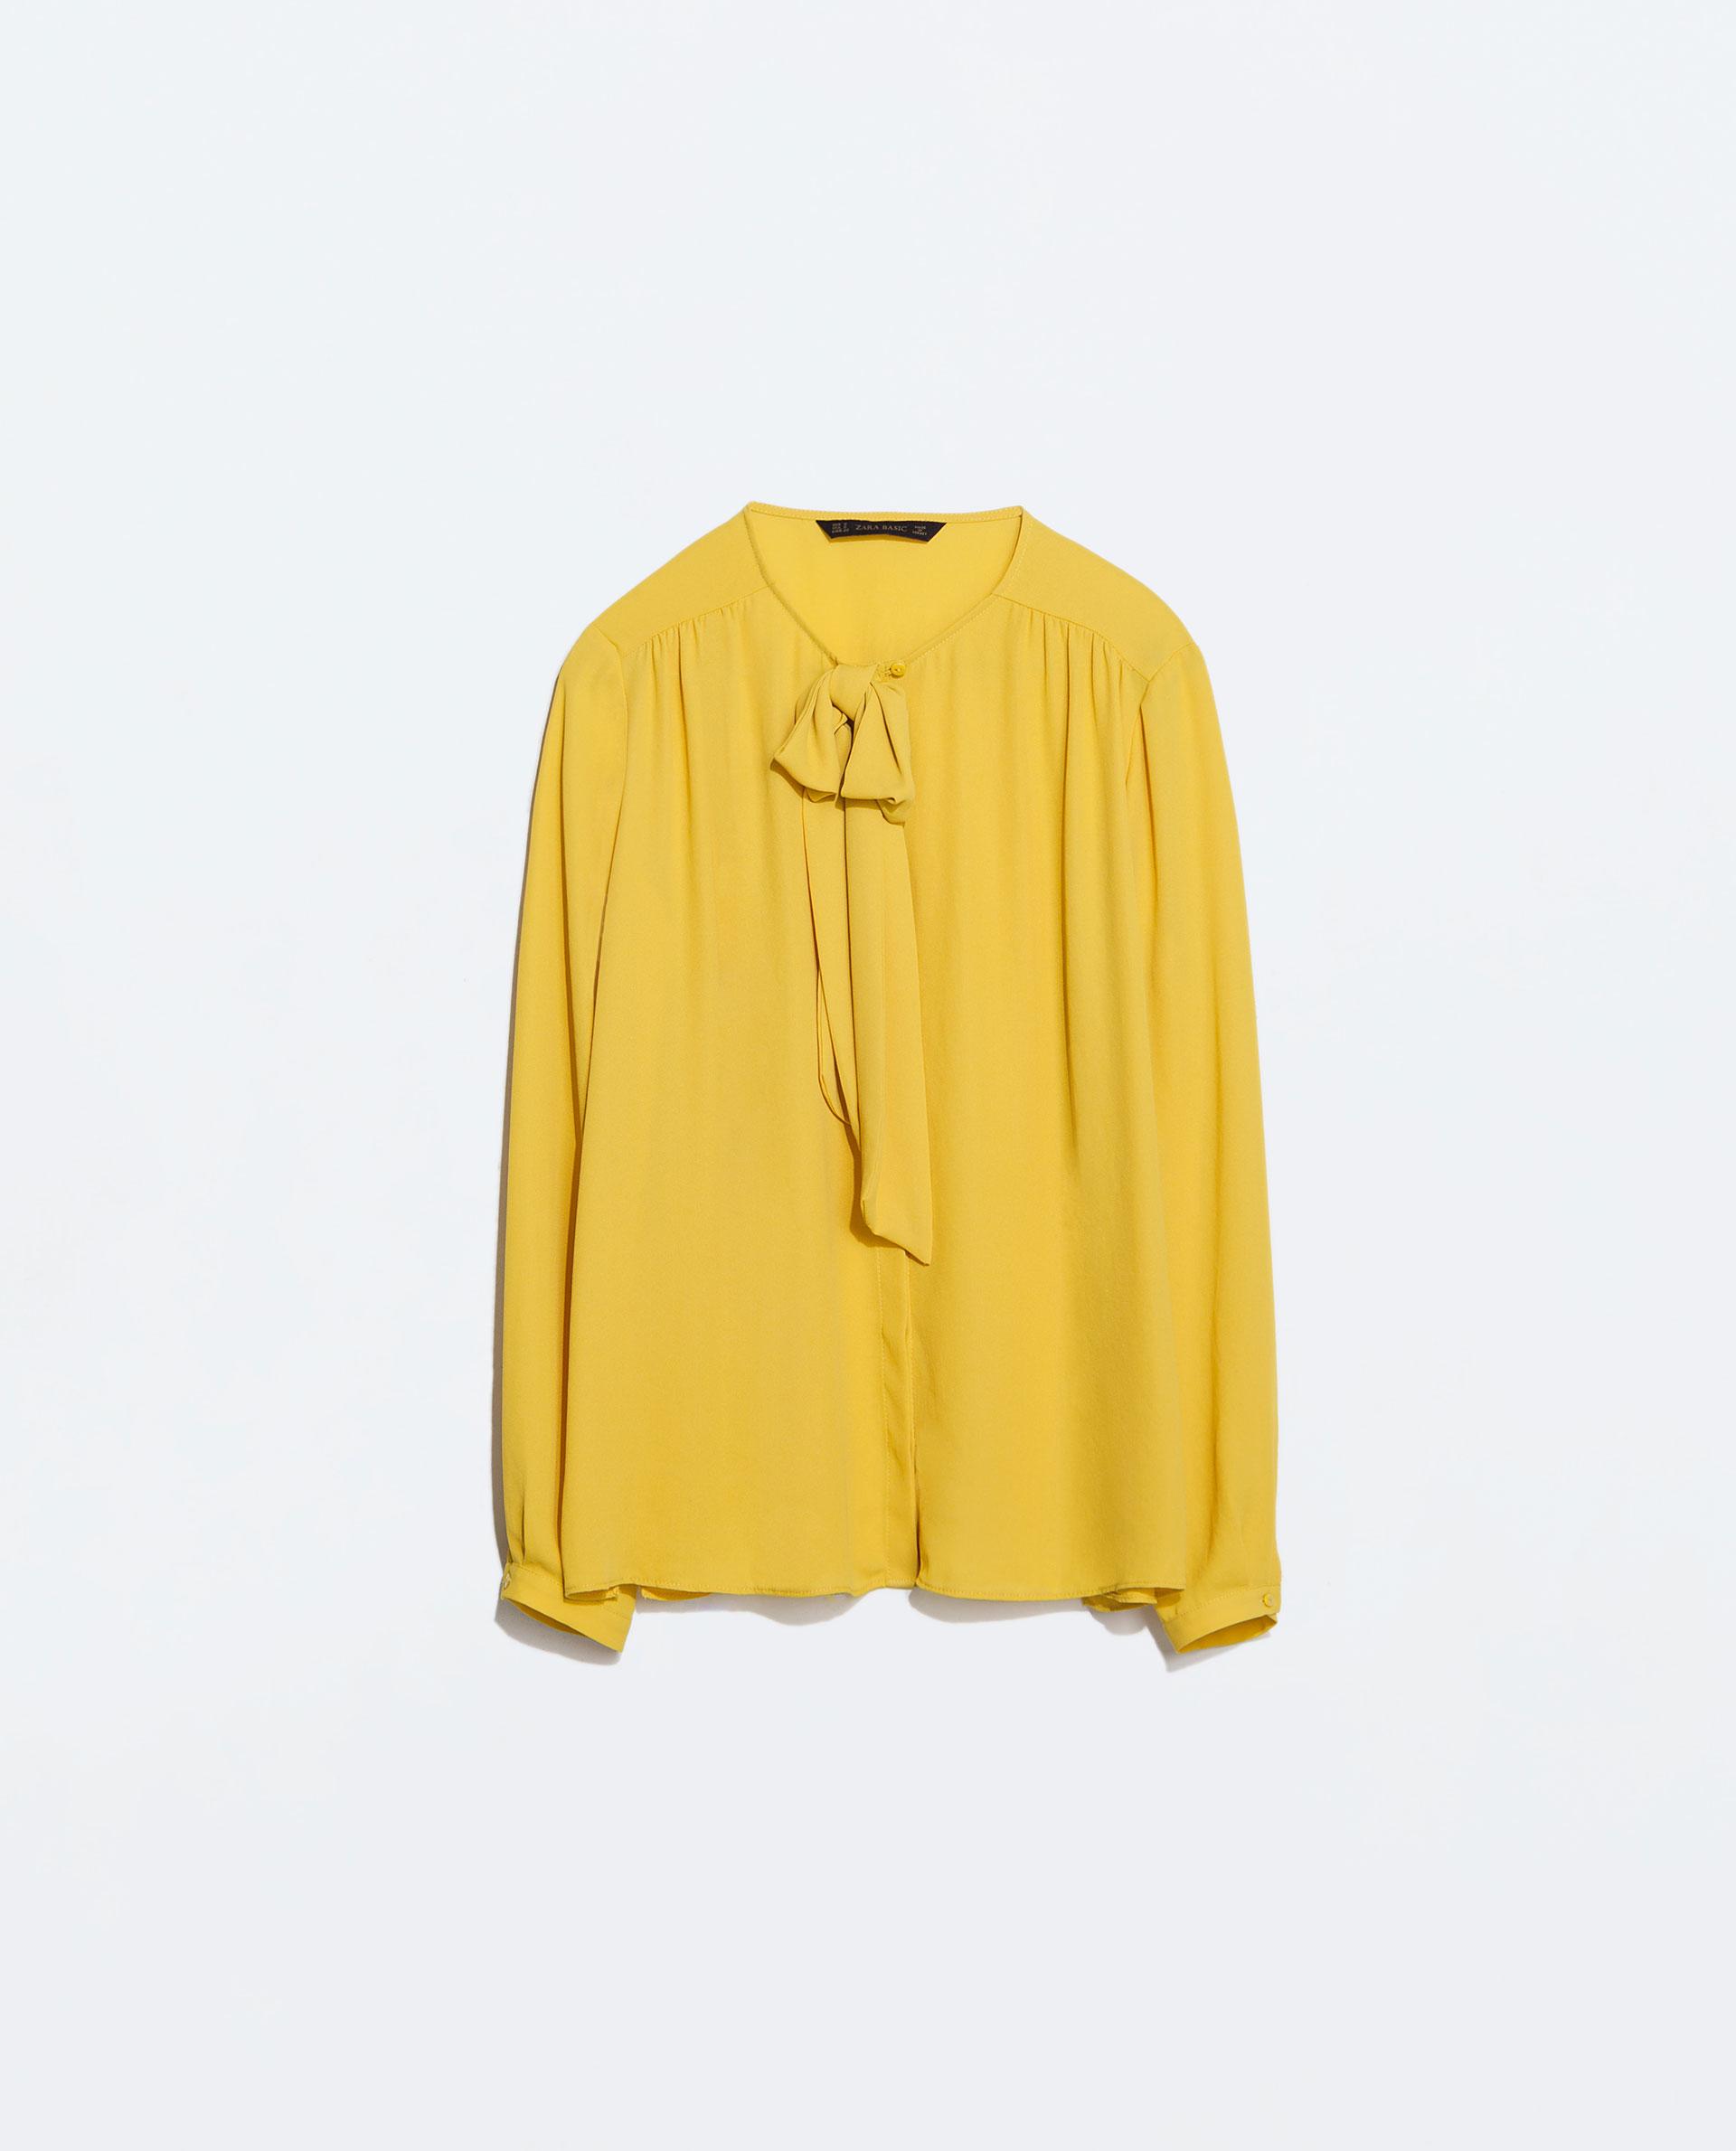 c33b51a89d2b3f By Day By Night Center Shirt with Bow collar - BELLA New York Magazine